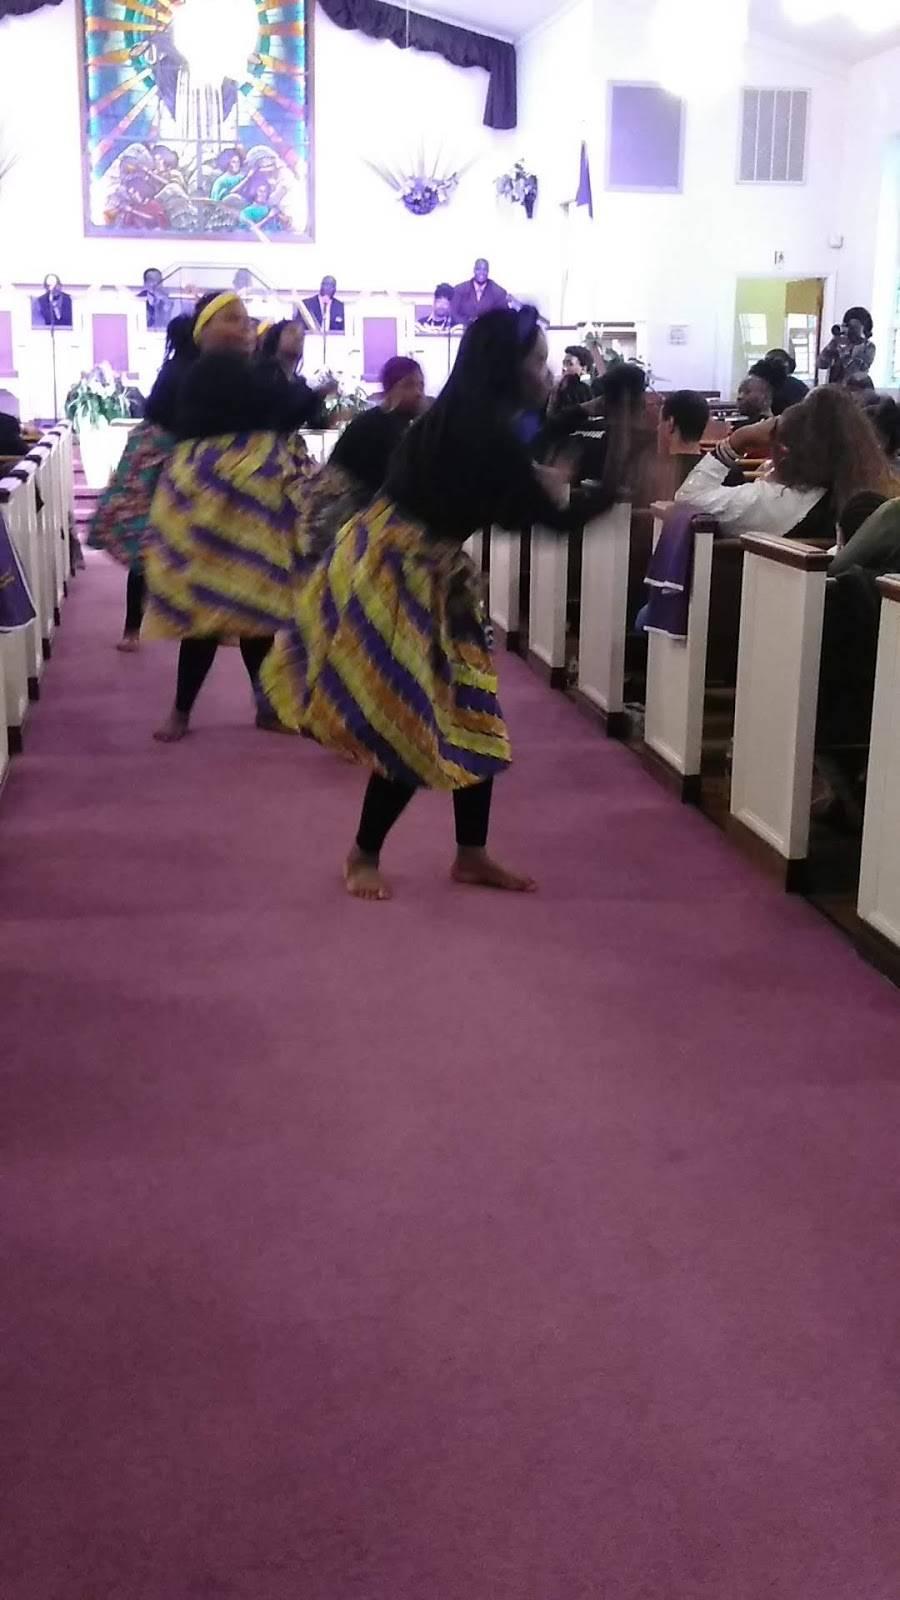 Seed Time & Harvest Fellowship Church - church  | Photo 2 of 10 | Address: 804 Berwyn Ave, Durham, NC 27704, USA | Phone: (919) 220-2896